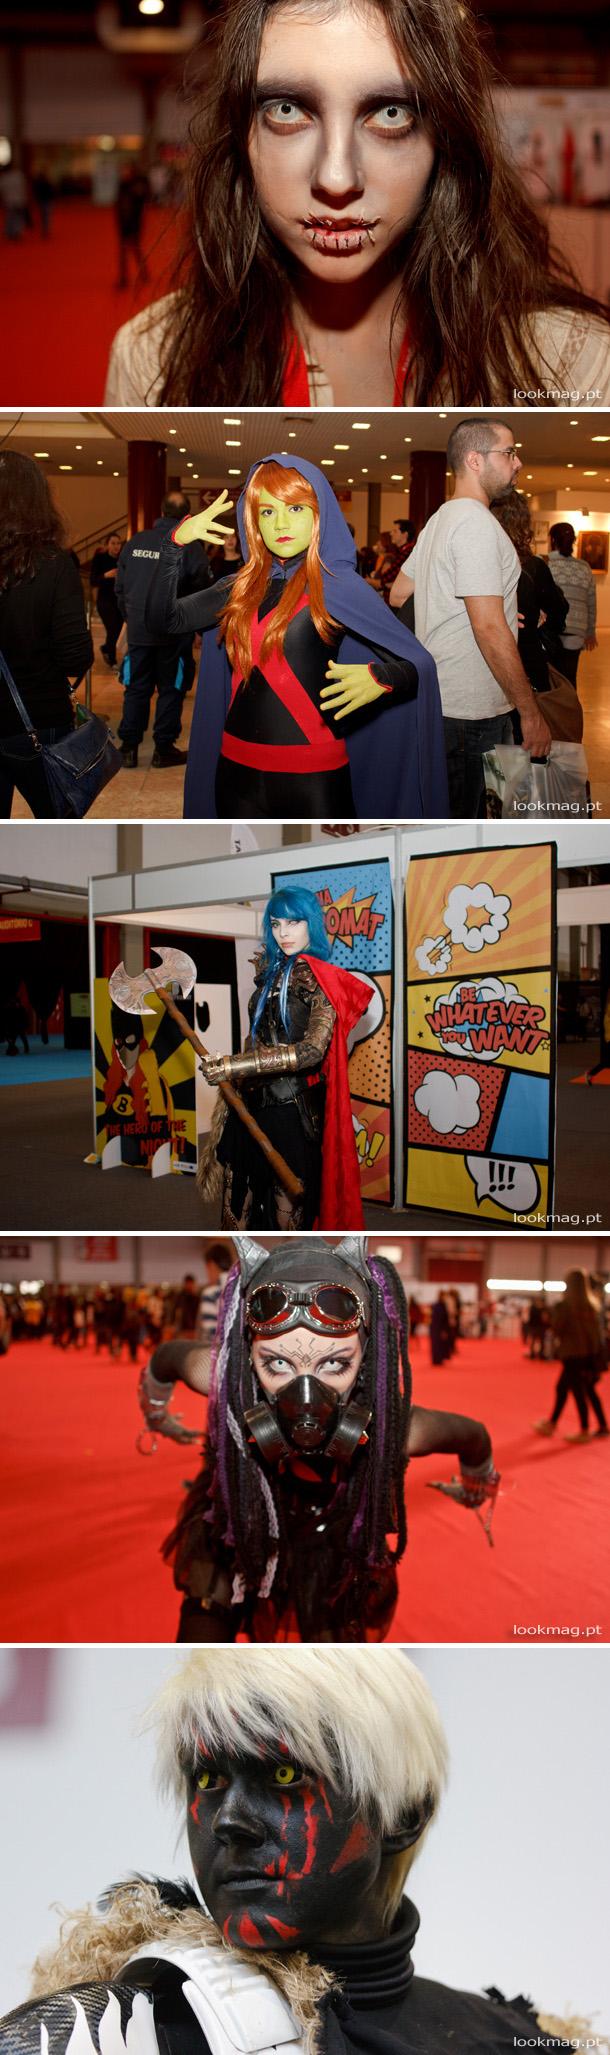 Comic_Con_2015-LookMag_pt-30-31-32-33-34